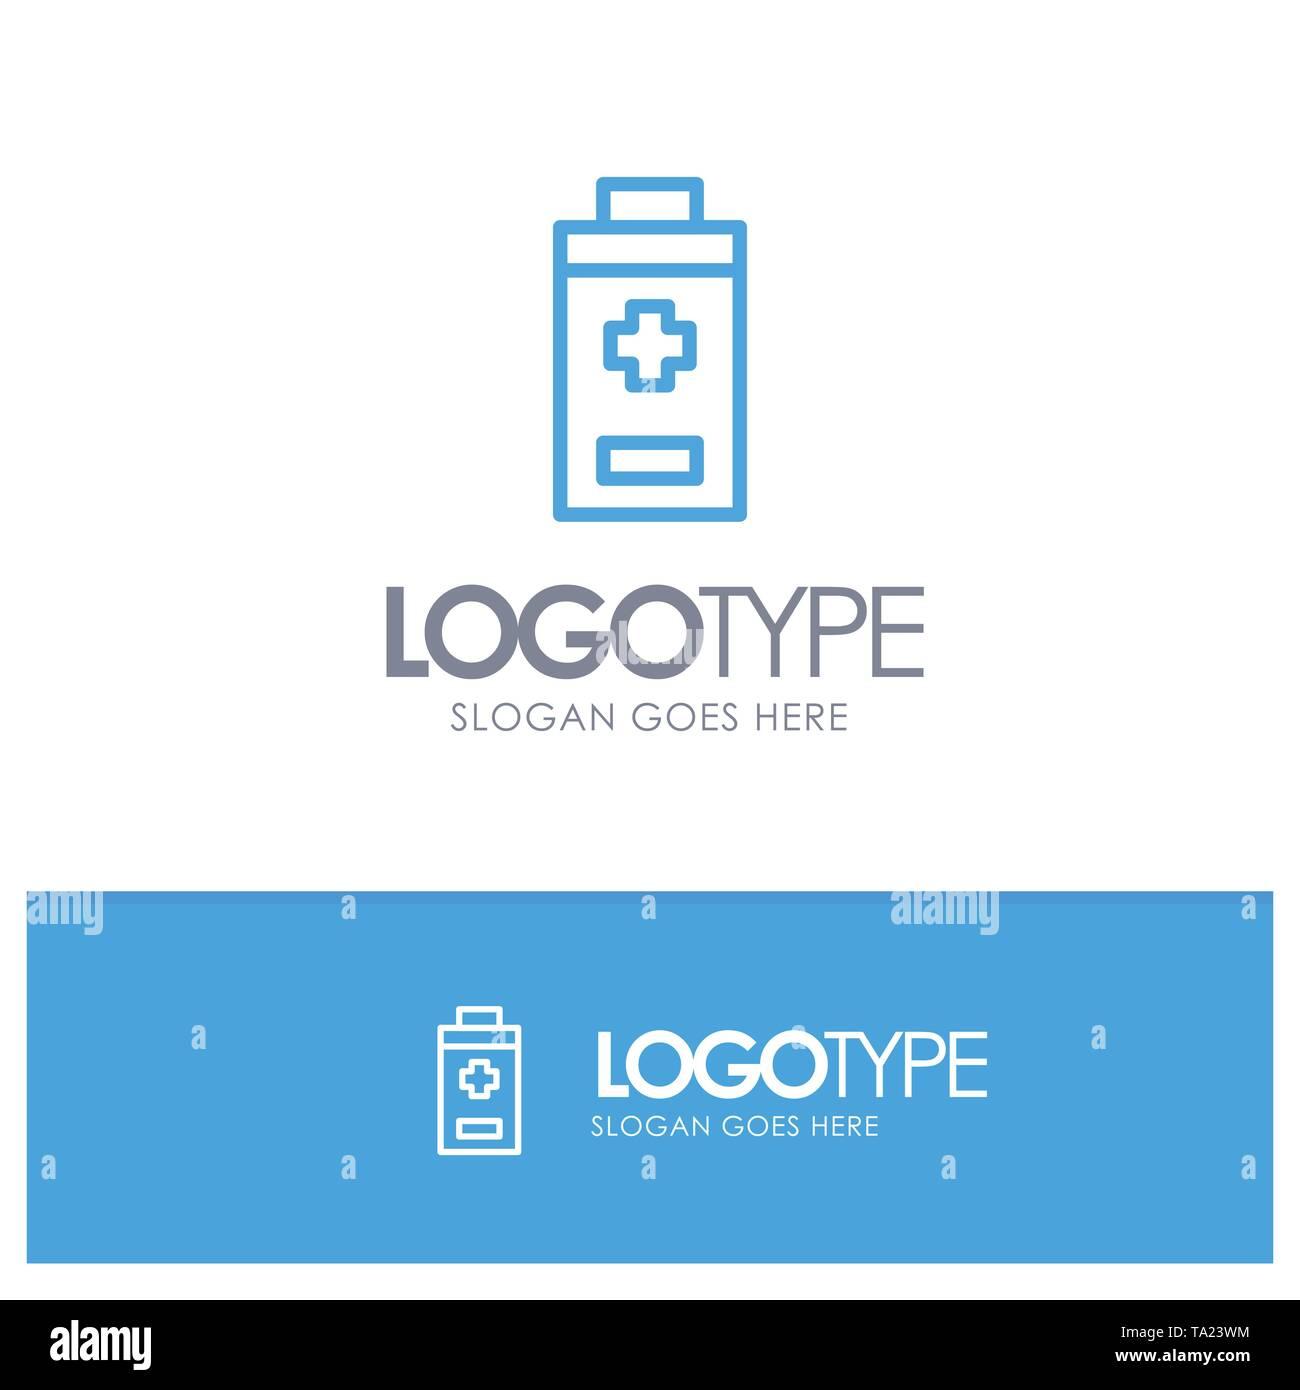 Battery, Minus, Plus Blue Outline Logo Place for Tagline - Stock Image